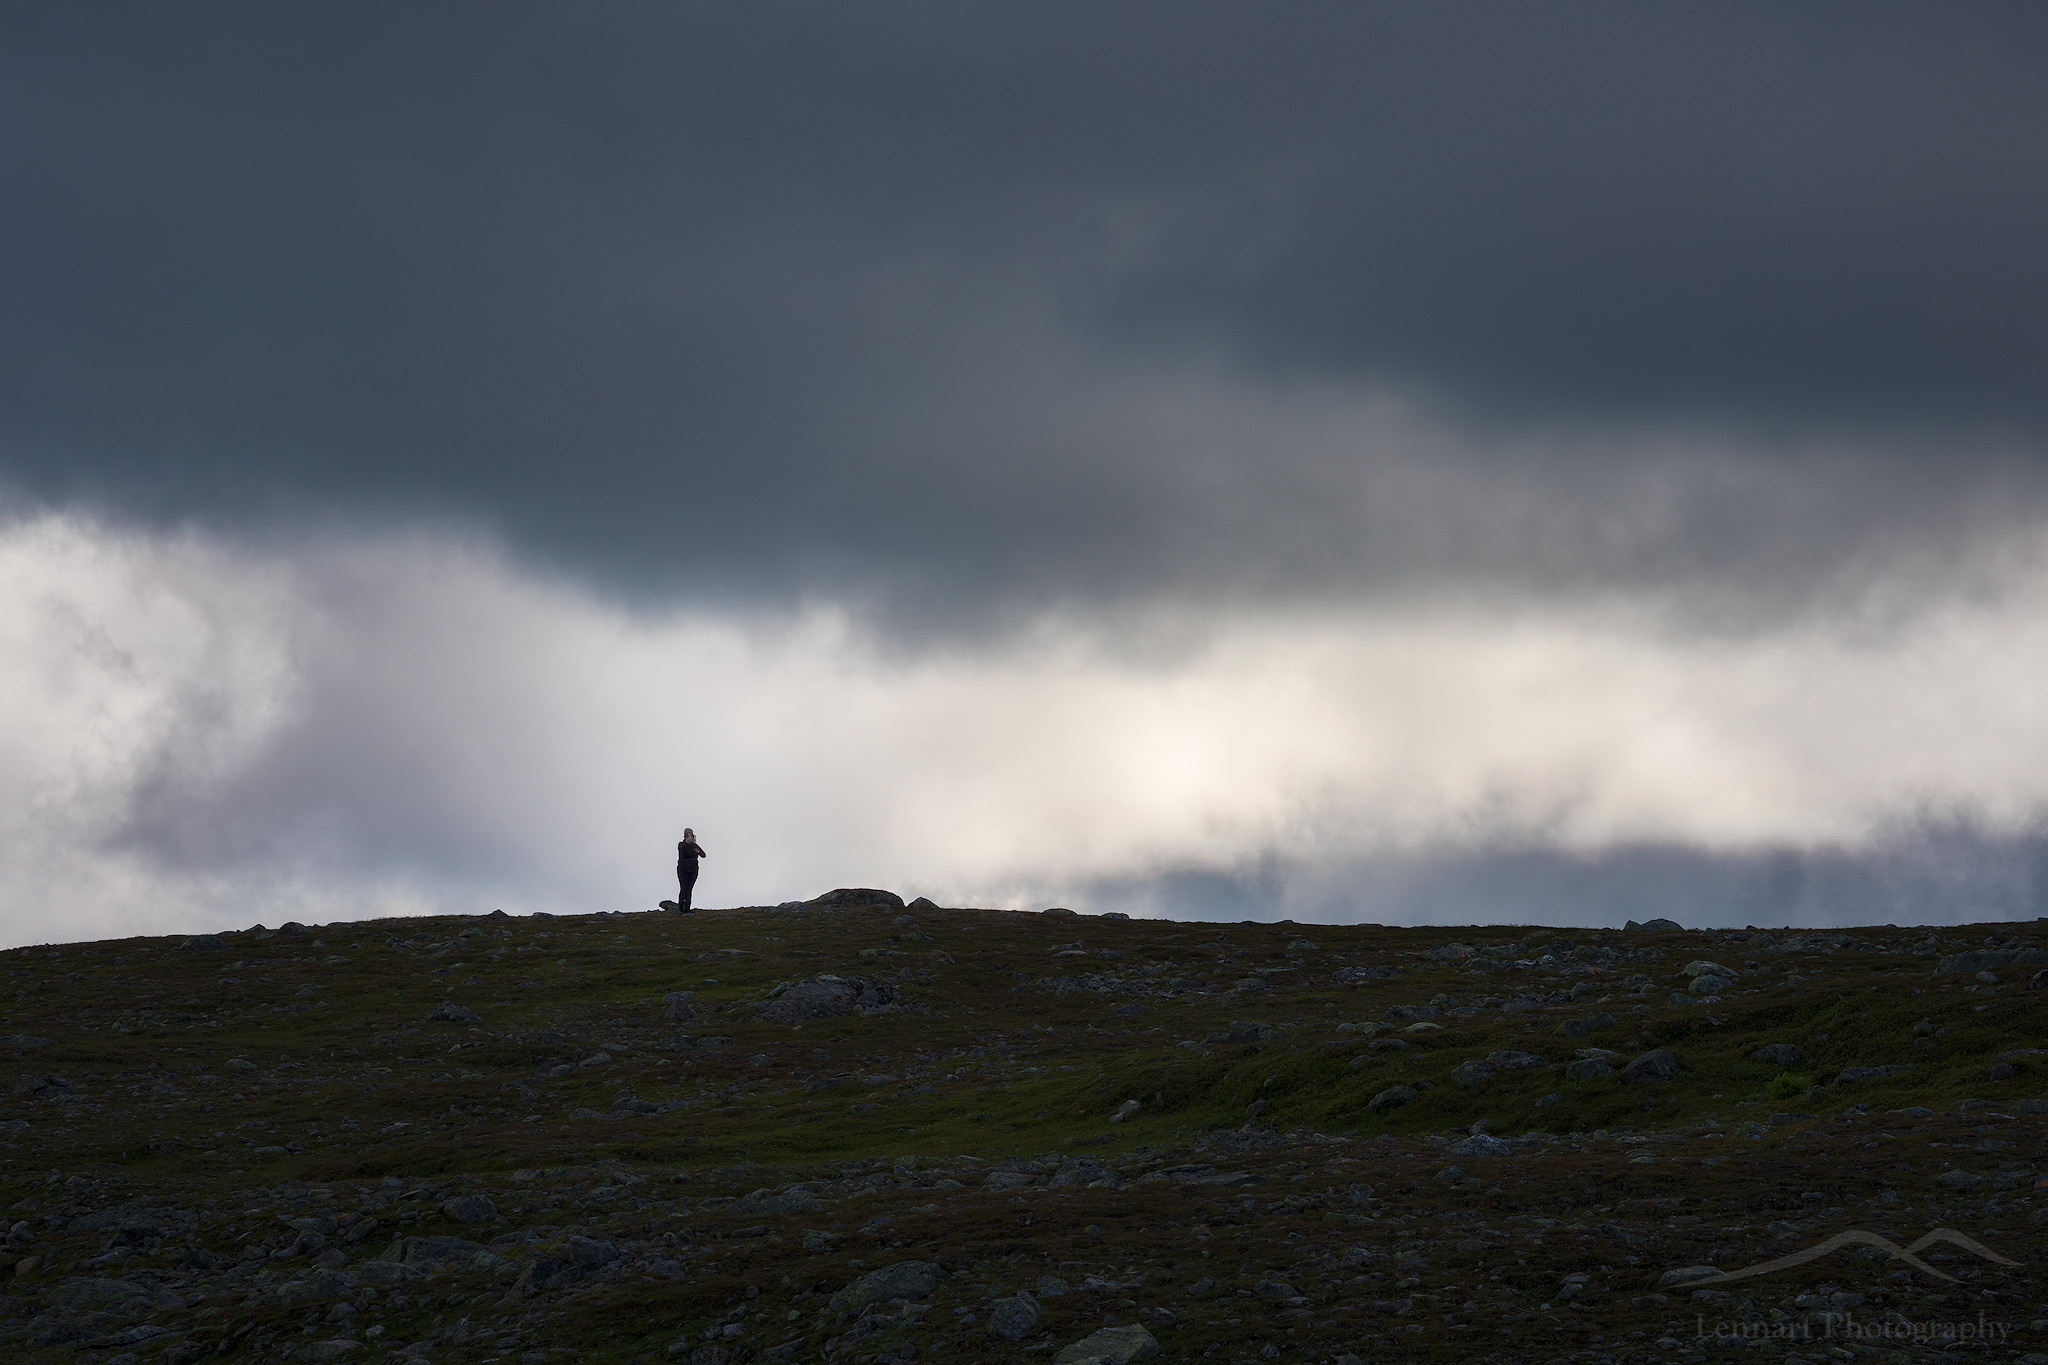 Dark clouds   Frostviksfjällen, Jämtland